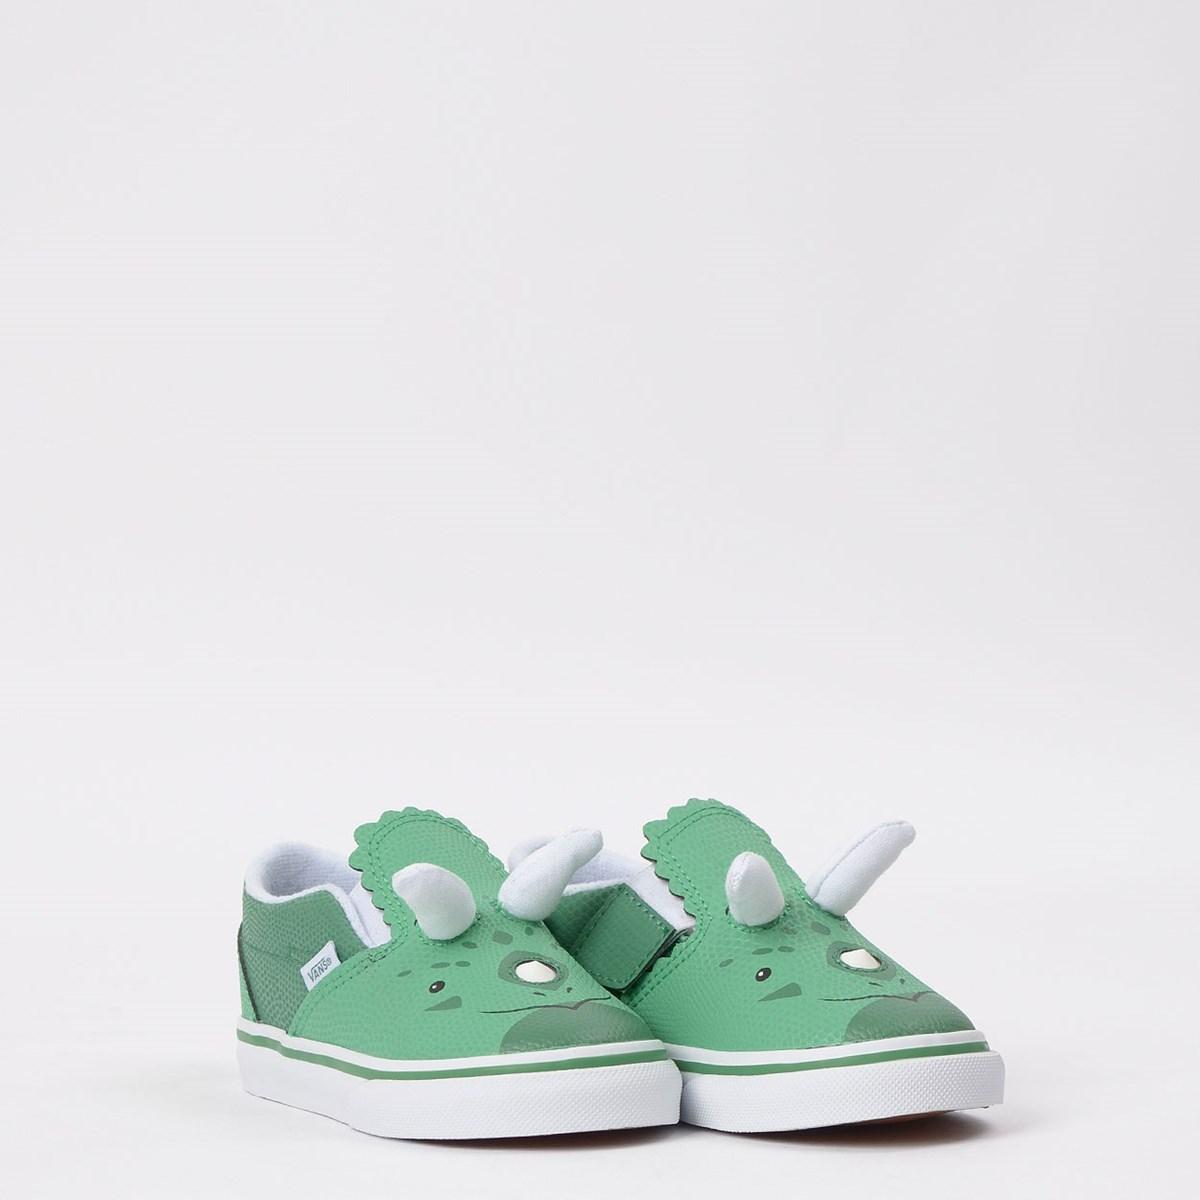 Tênis Vans Kids Slip On V Dino Triceratops True White Green VN0A4UWD17L